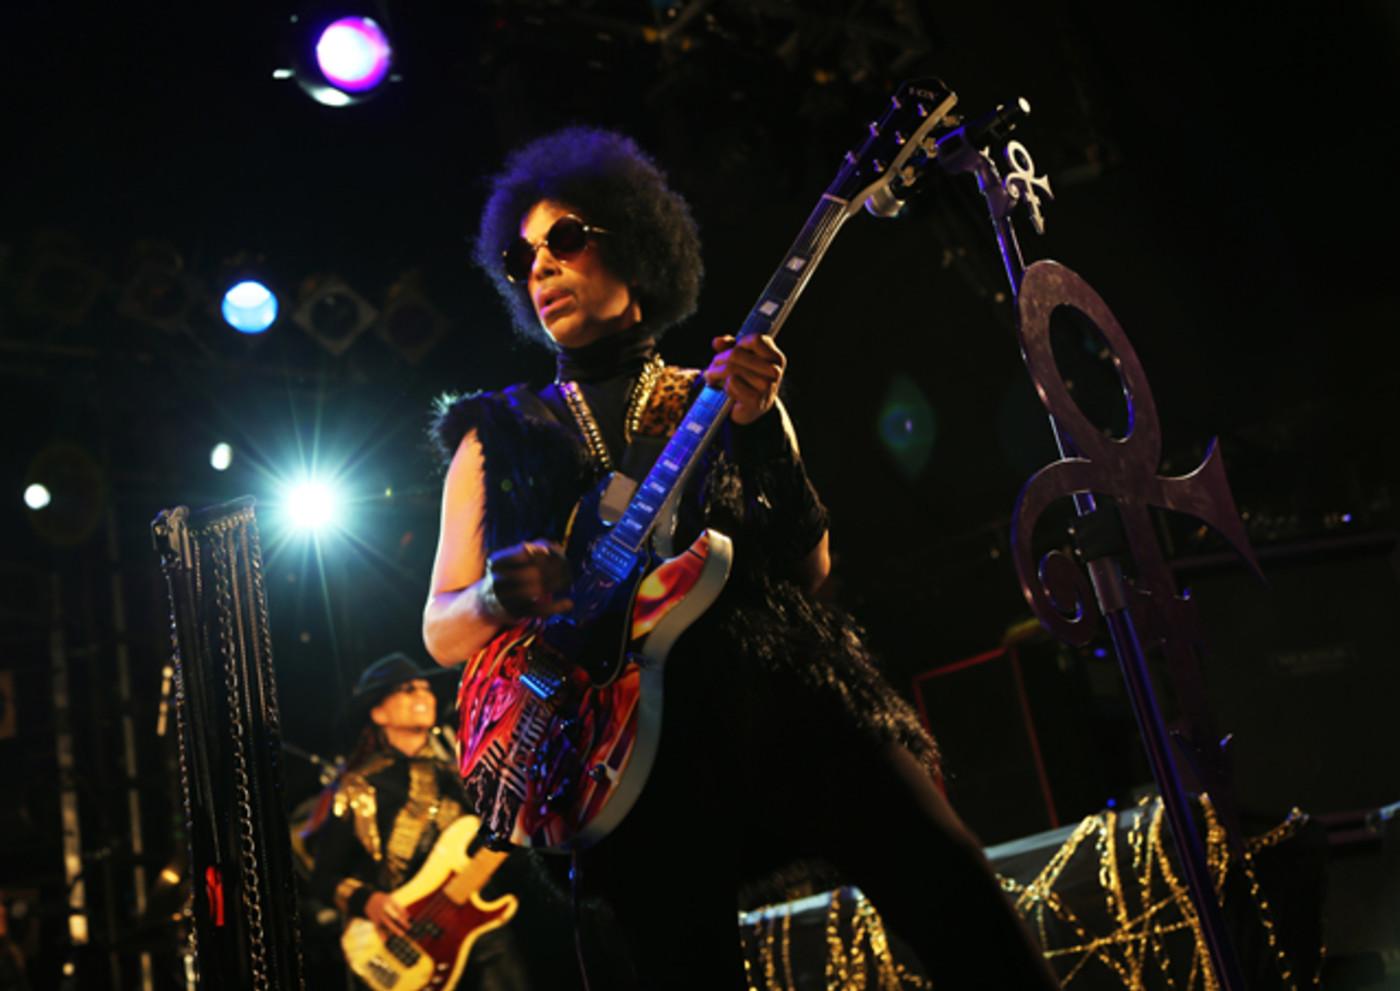 Prince live at Electric Ballroom UK